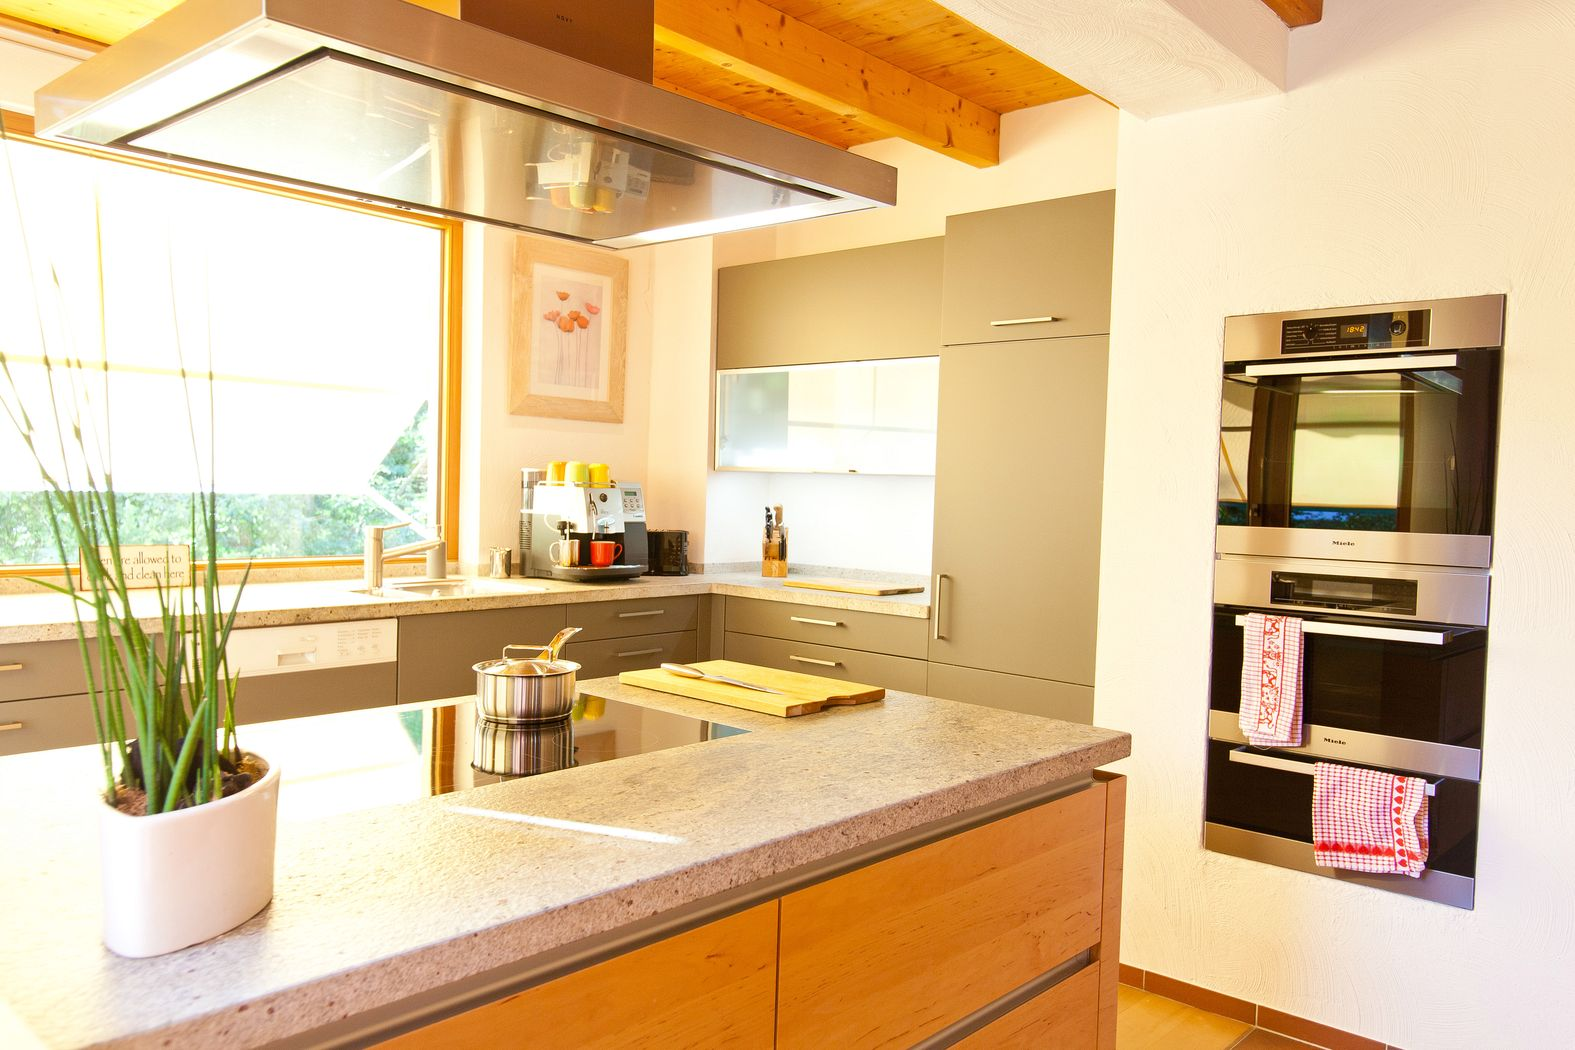 Arbeitsplatte Küche Granit Holz | wotzc.com